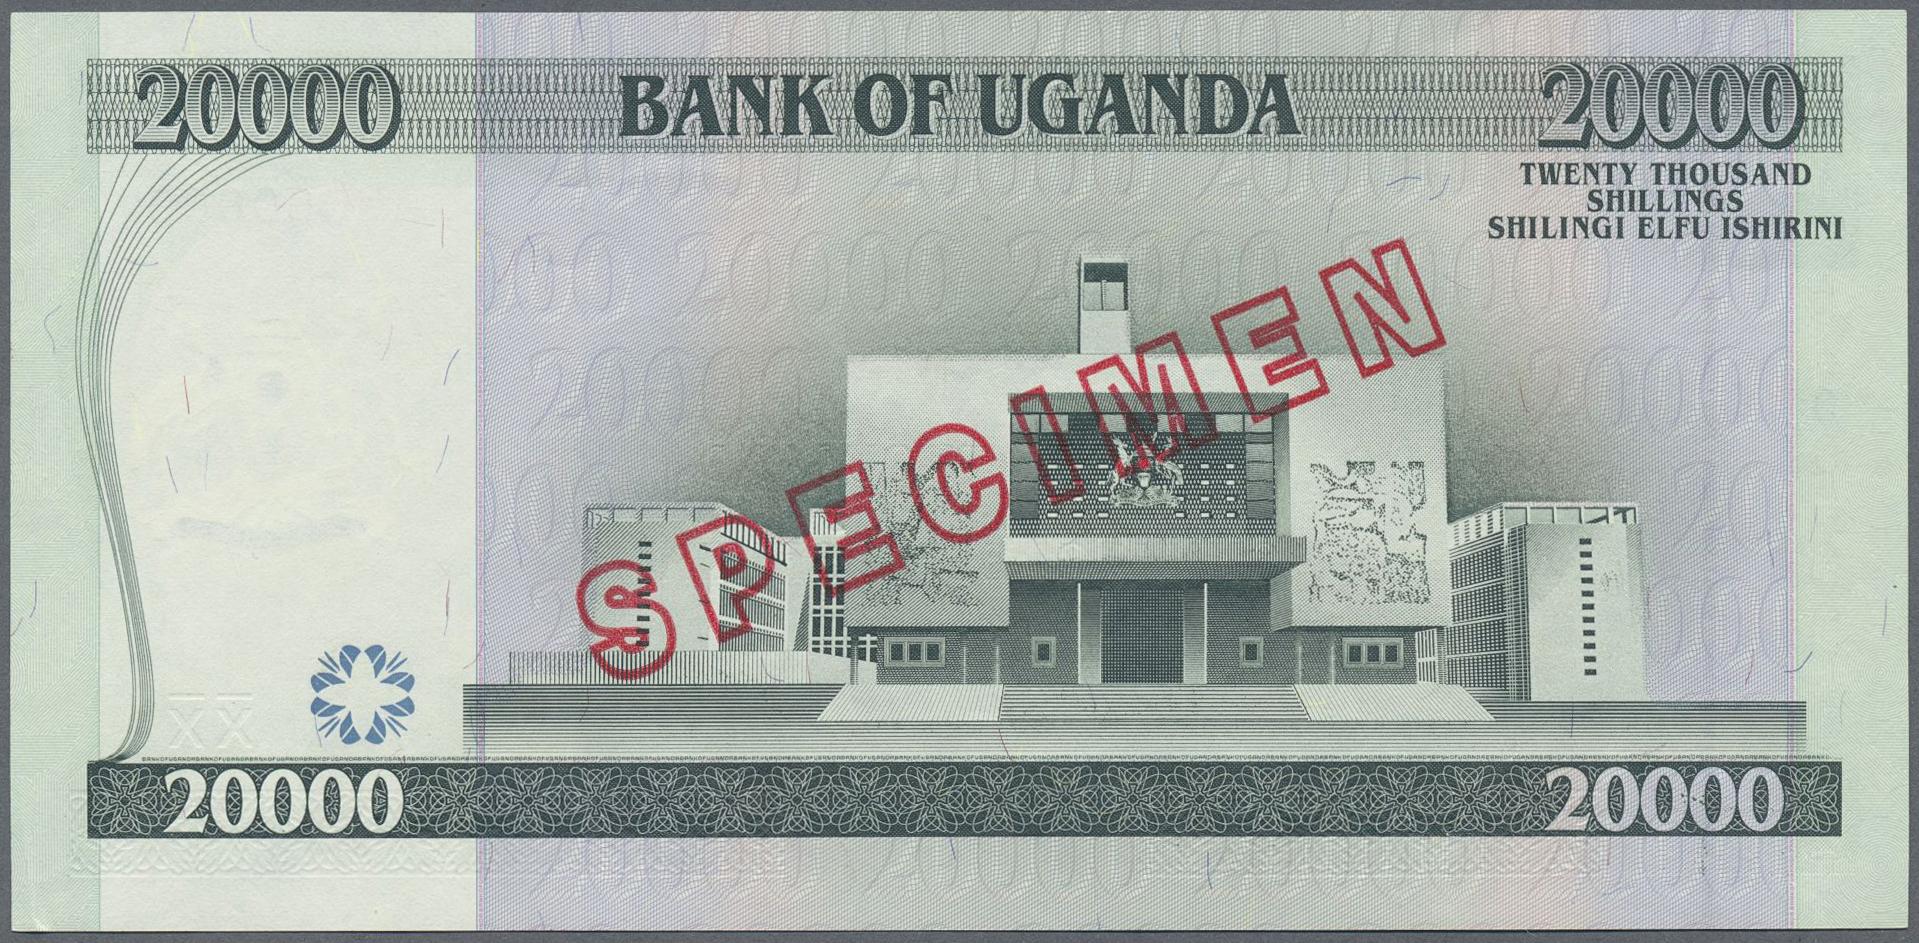 Lot 2144 - Uganda | Banknoten  -  Auktionshaus Christoph Gärtner GmbH & Co. KG Banknotes & Coins Auction #39 Day 2